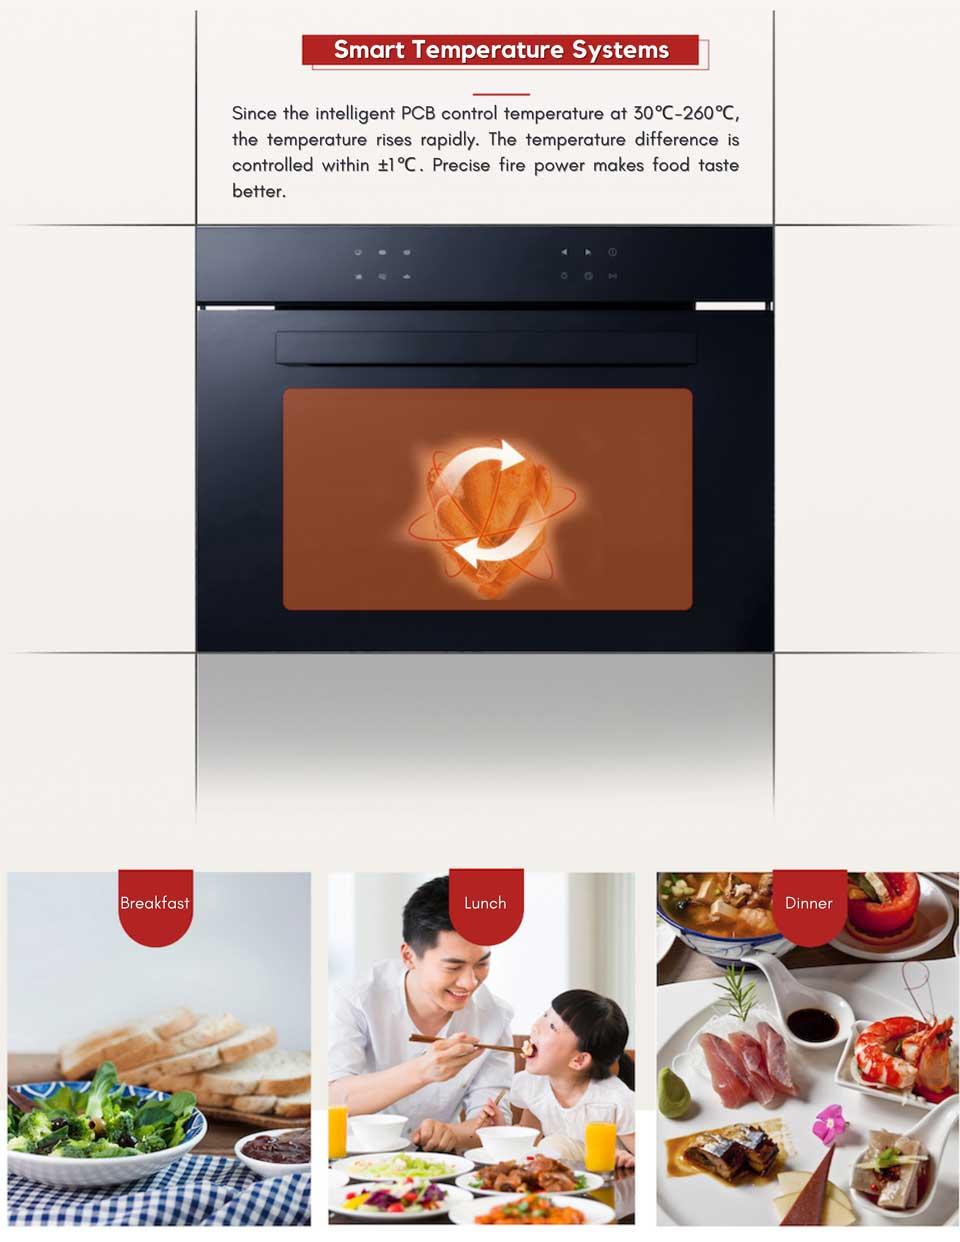 precise smart temperature system for even heating - DE&E ka4505 oven